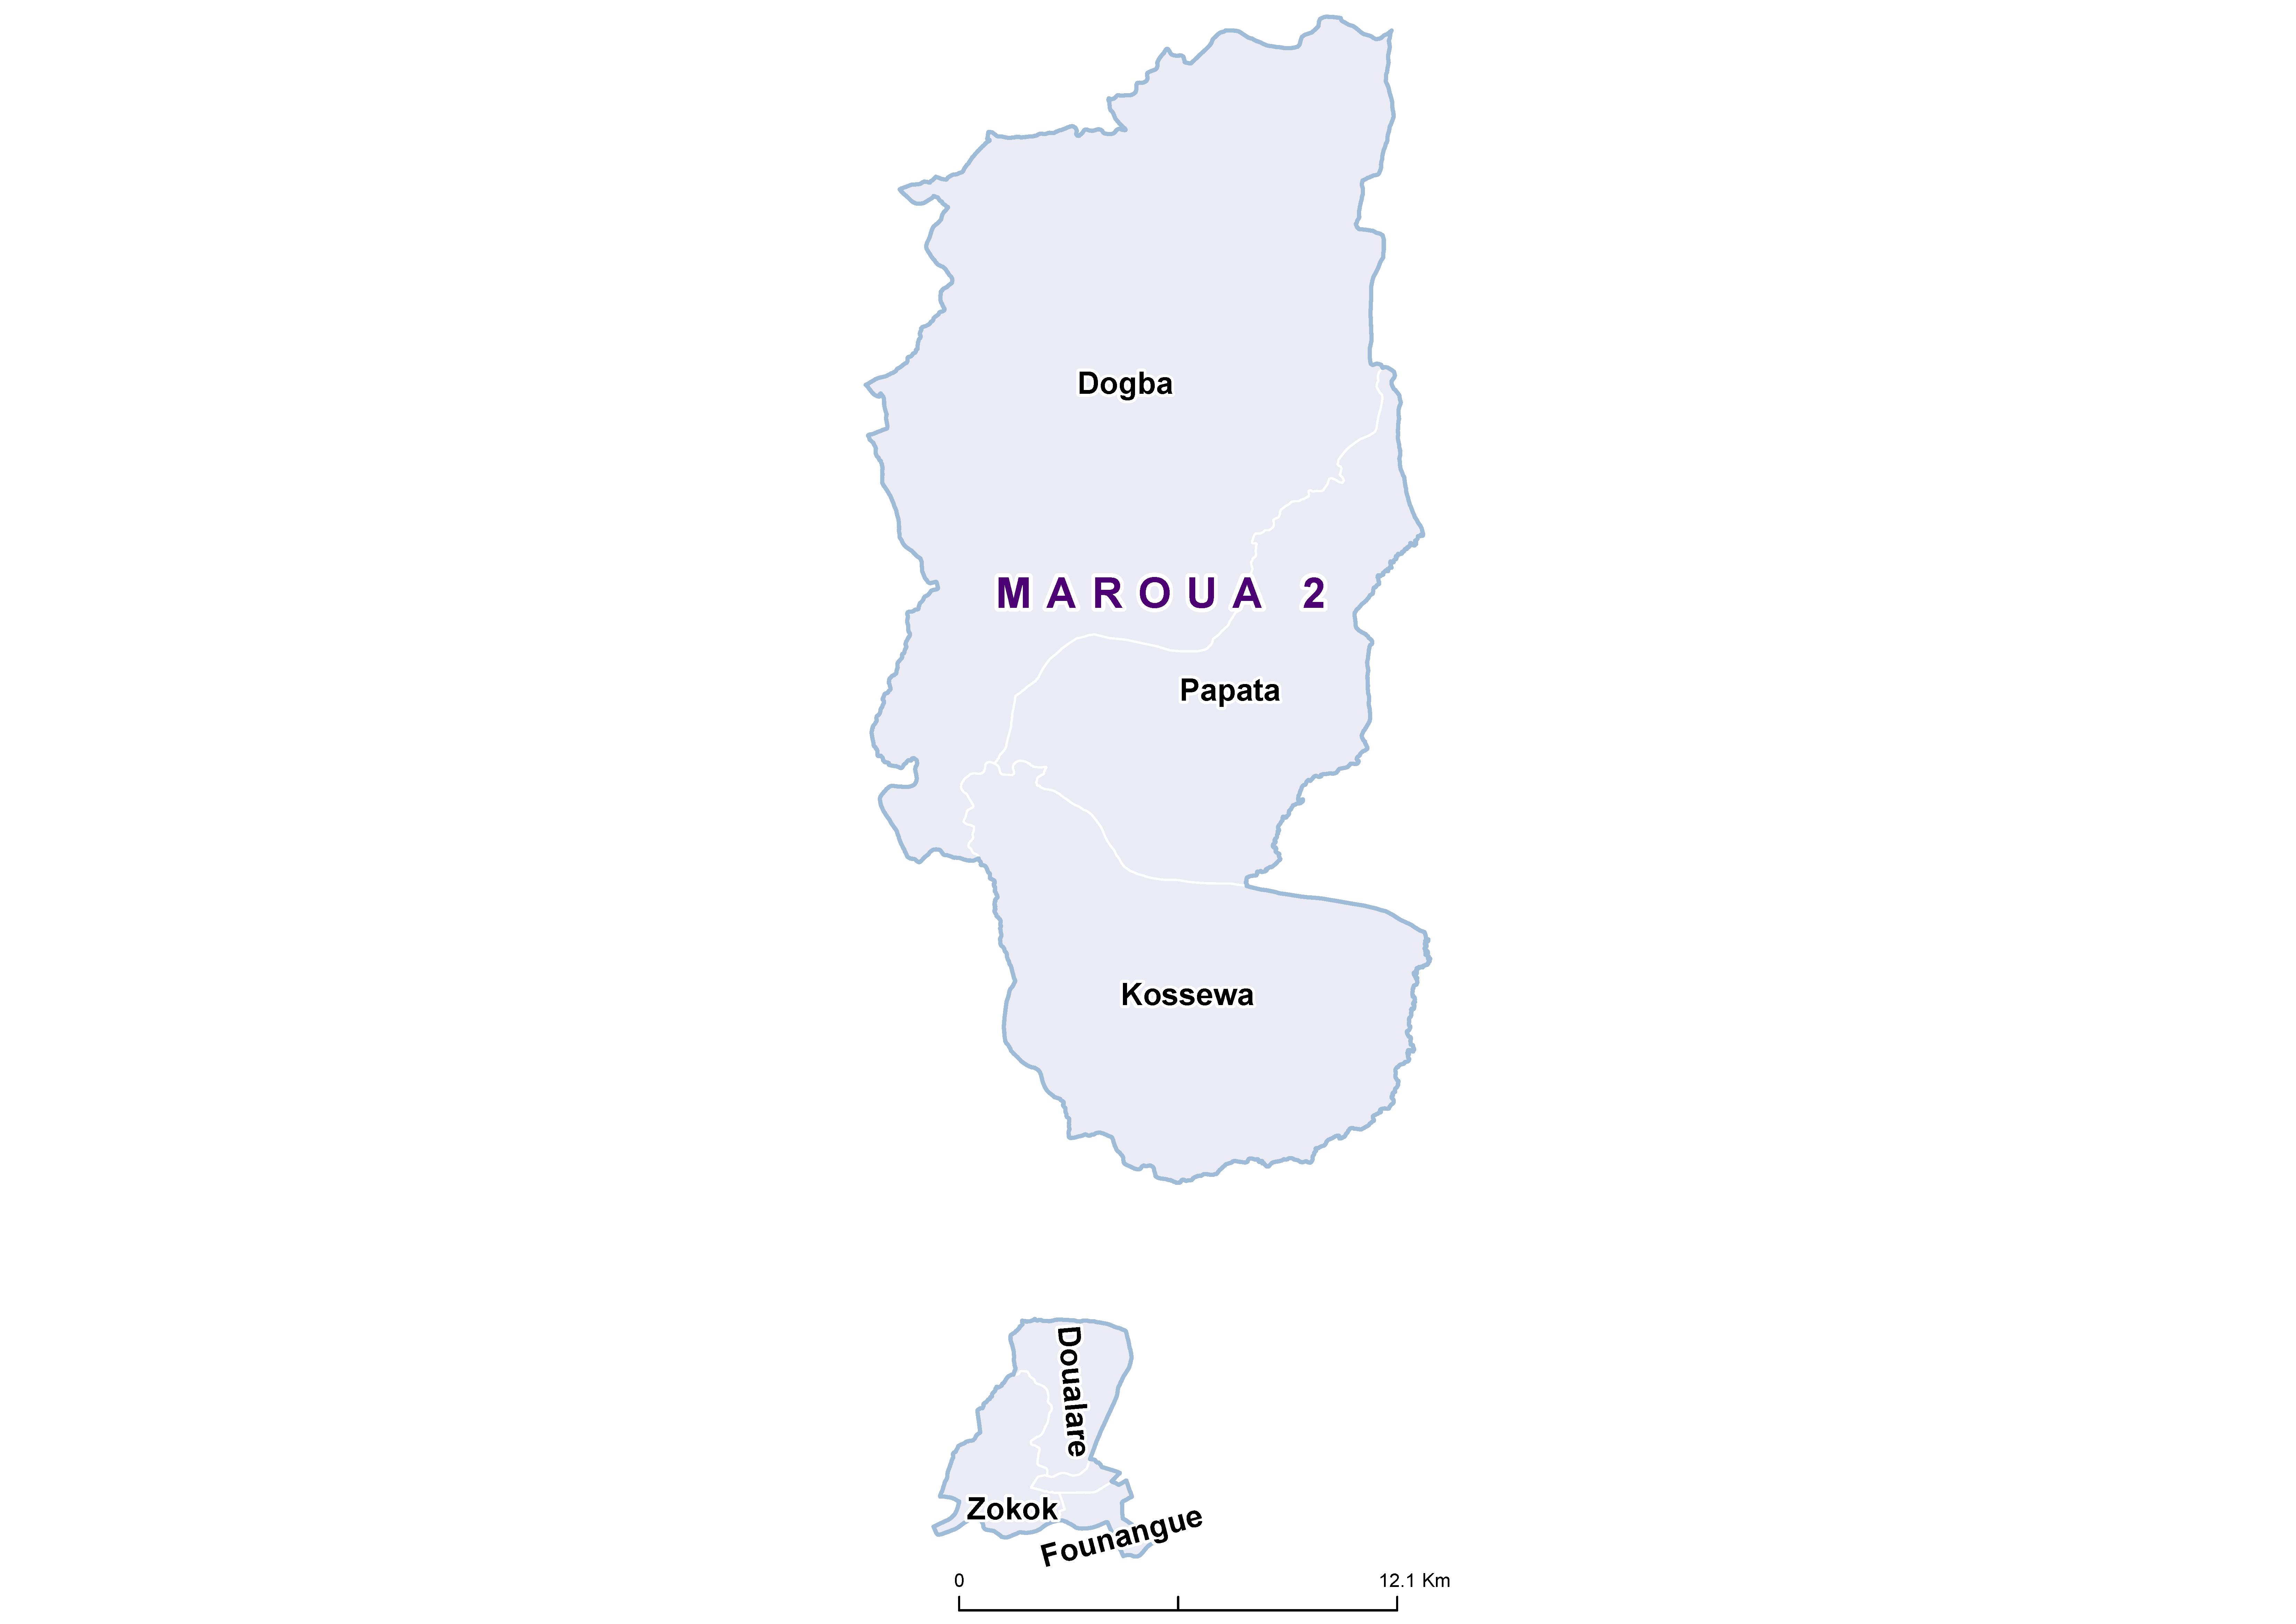 Maroua 2 SCH 19850001